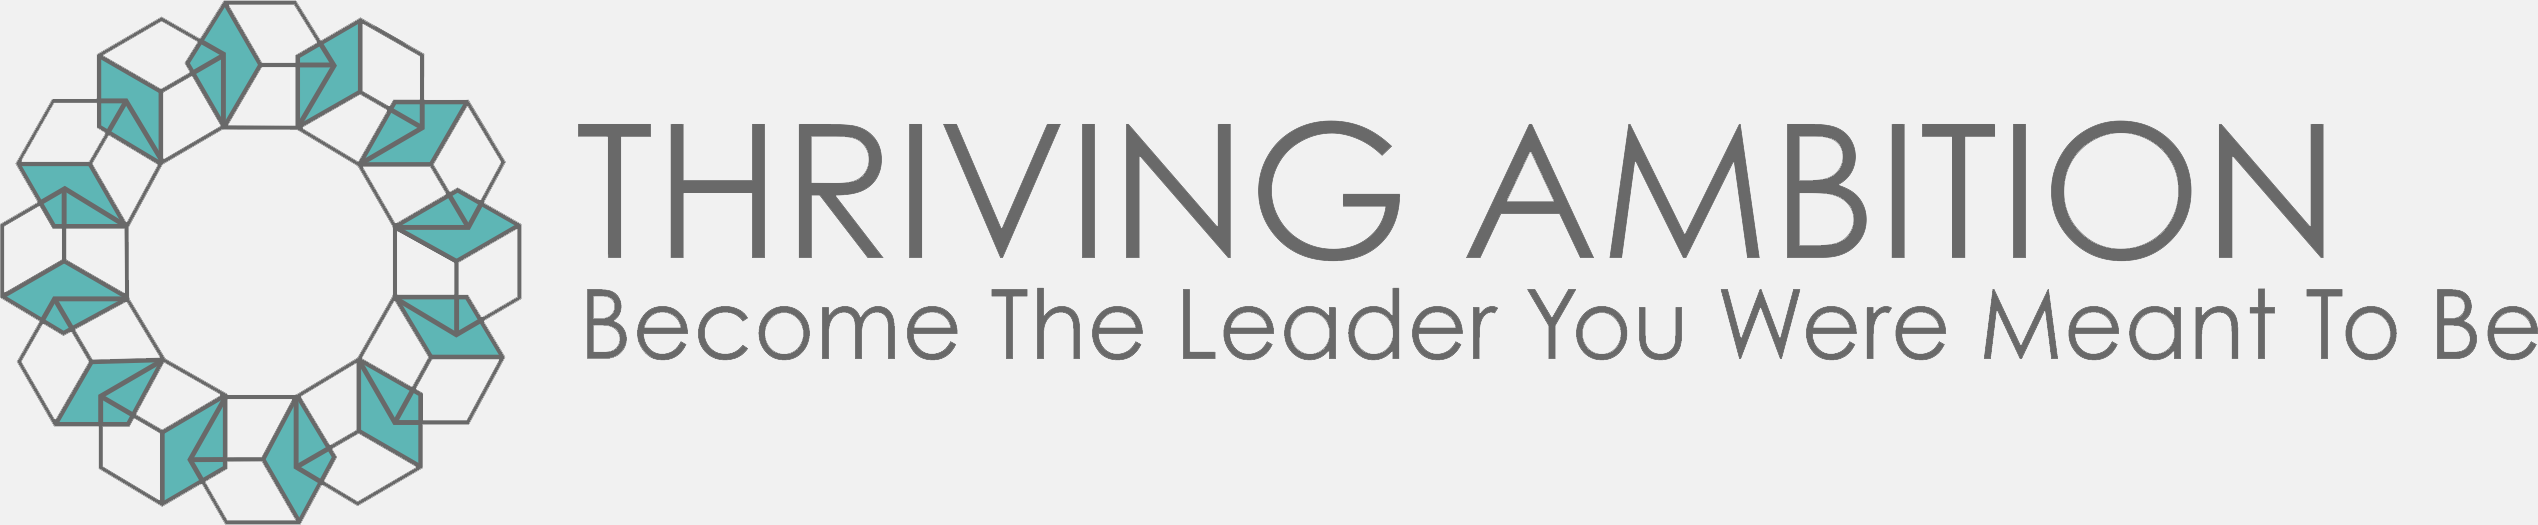 Thriving Ambition, Inc.